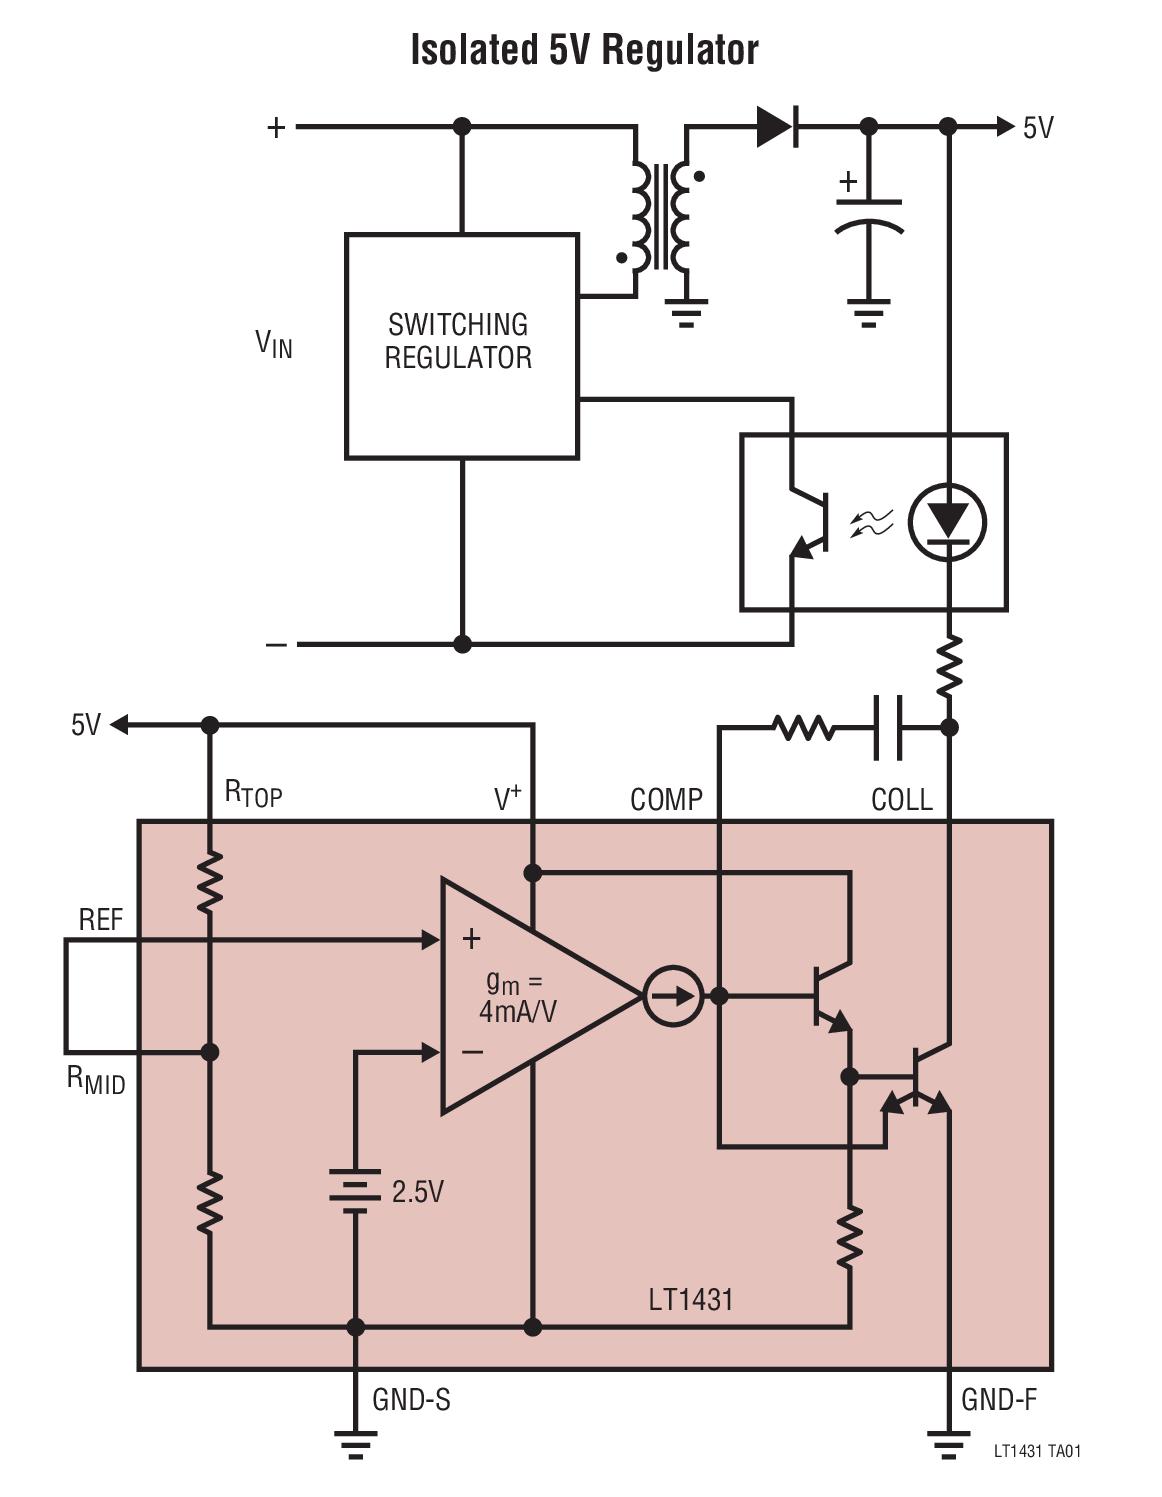 Lt1431 Datasheet The Is An Adjustable Shunt Voltage Regulator Monolithic Synchronous Stepdown Dc Converter Linear Technology Photo